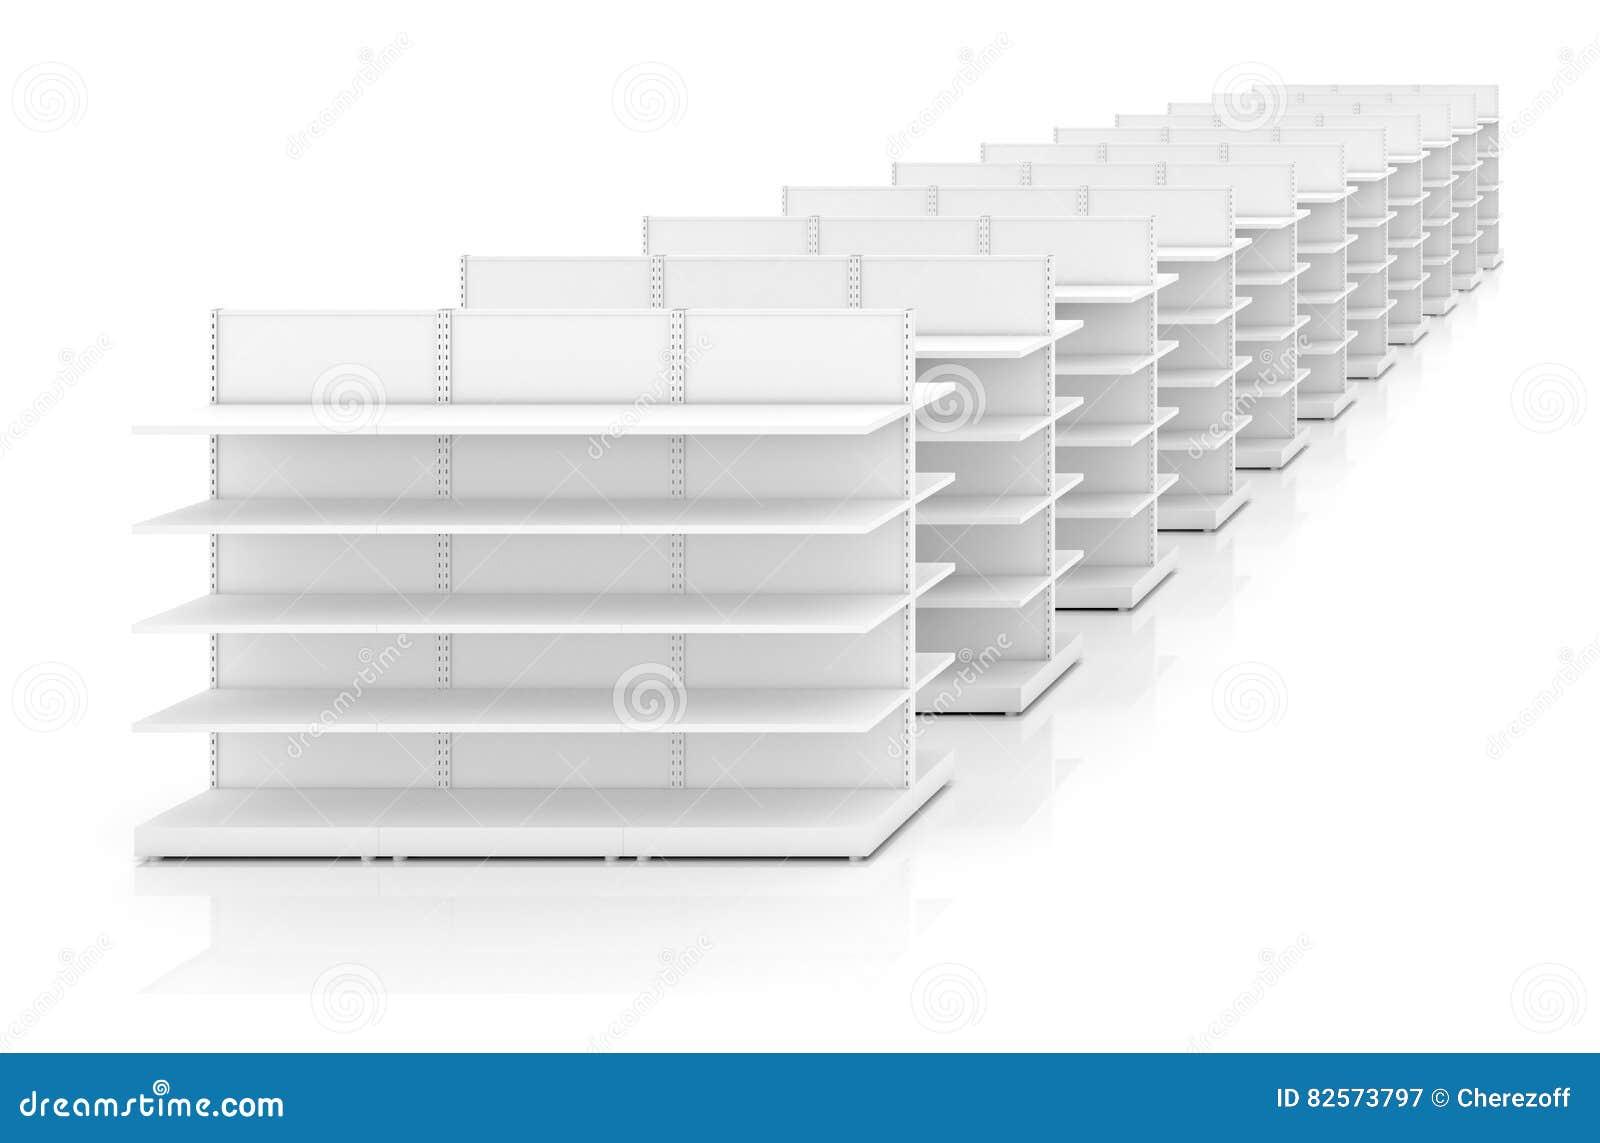 Row of supermarket shelves